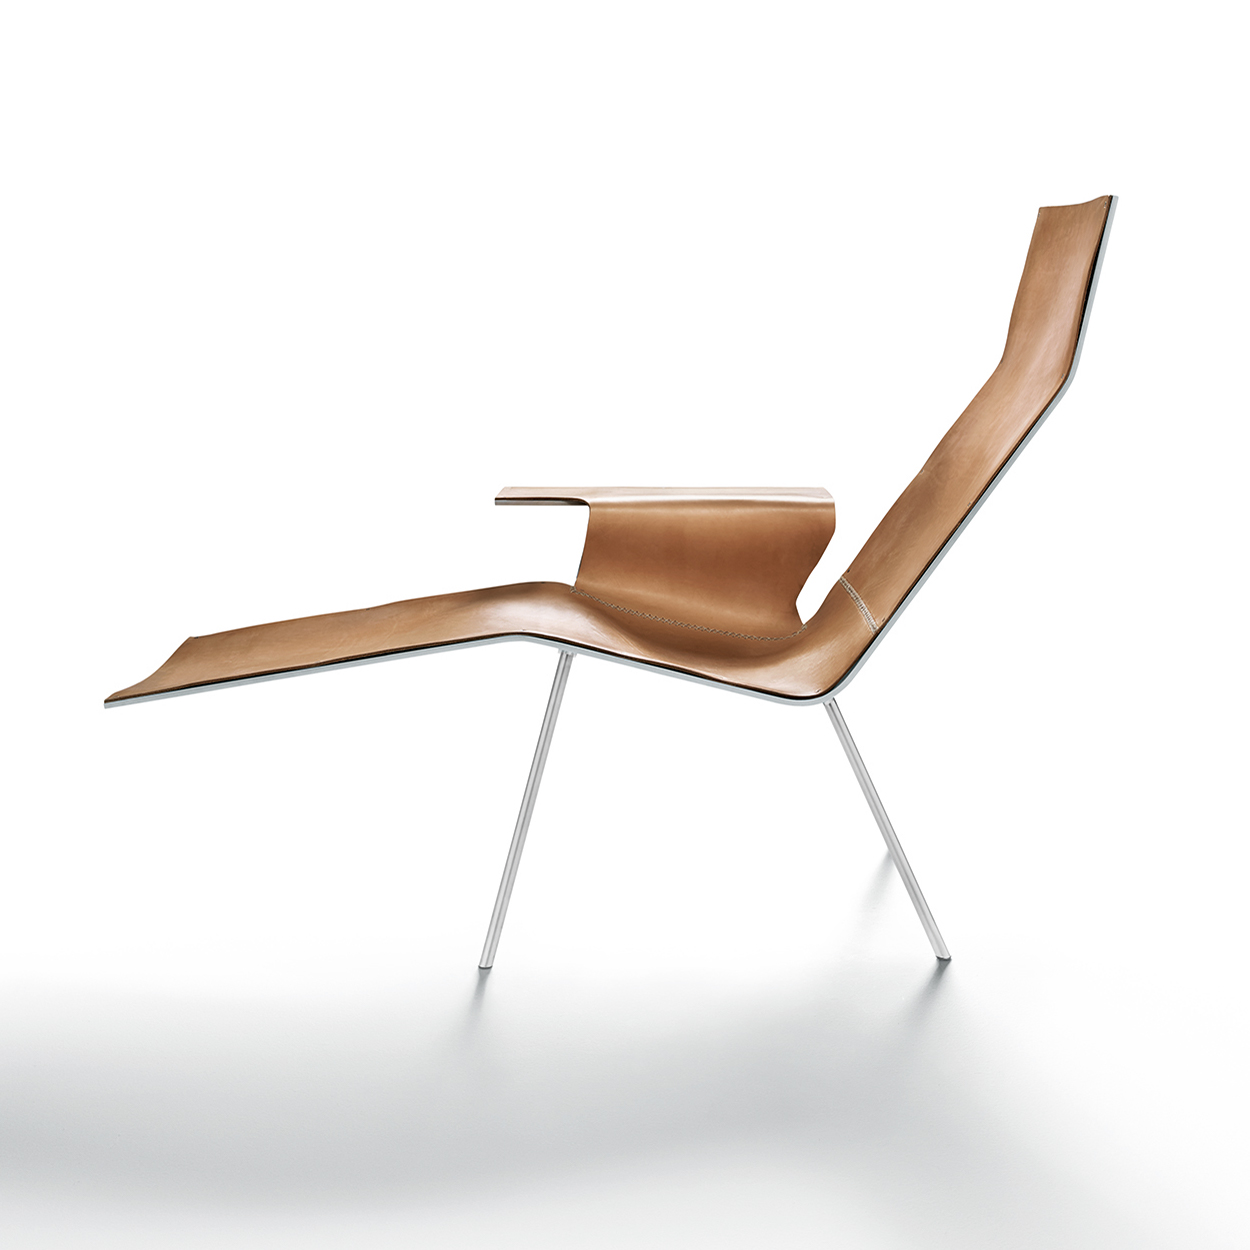 LL04 chair by De Padova